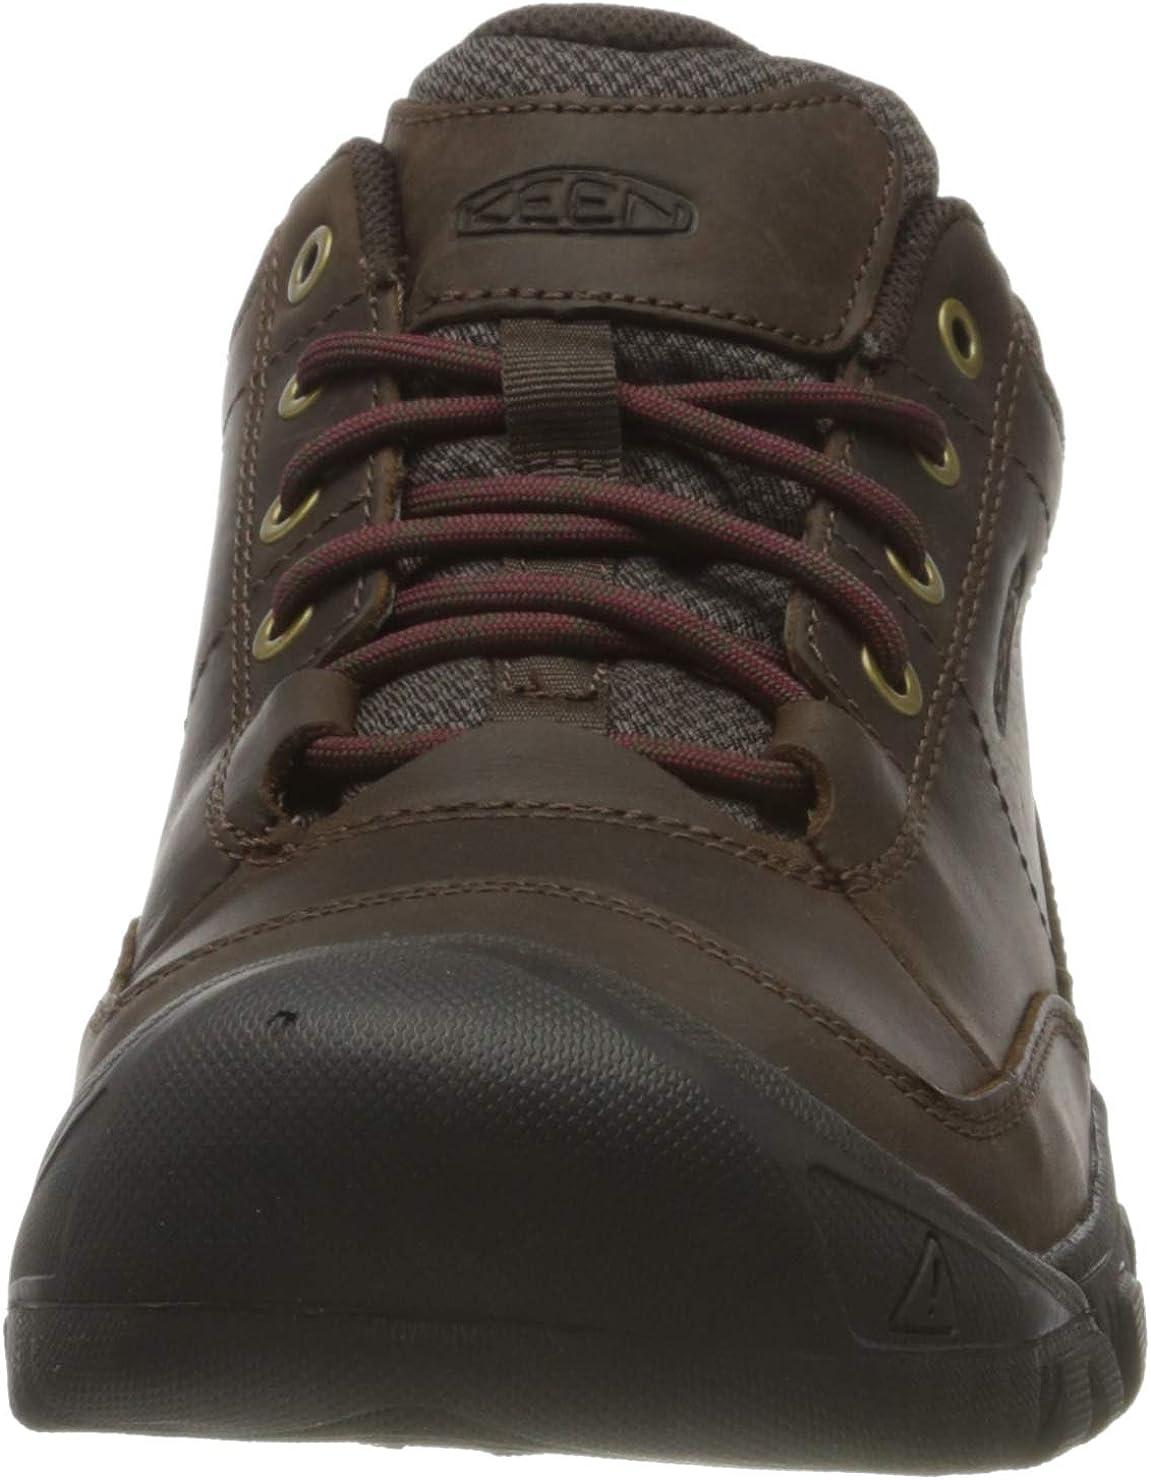 KEEN Mens Targhee Iii Oxford Hiking Shoe